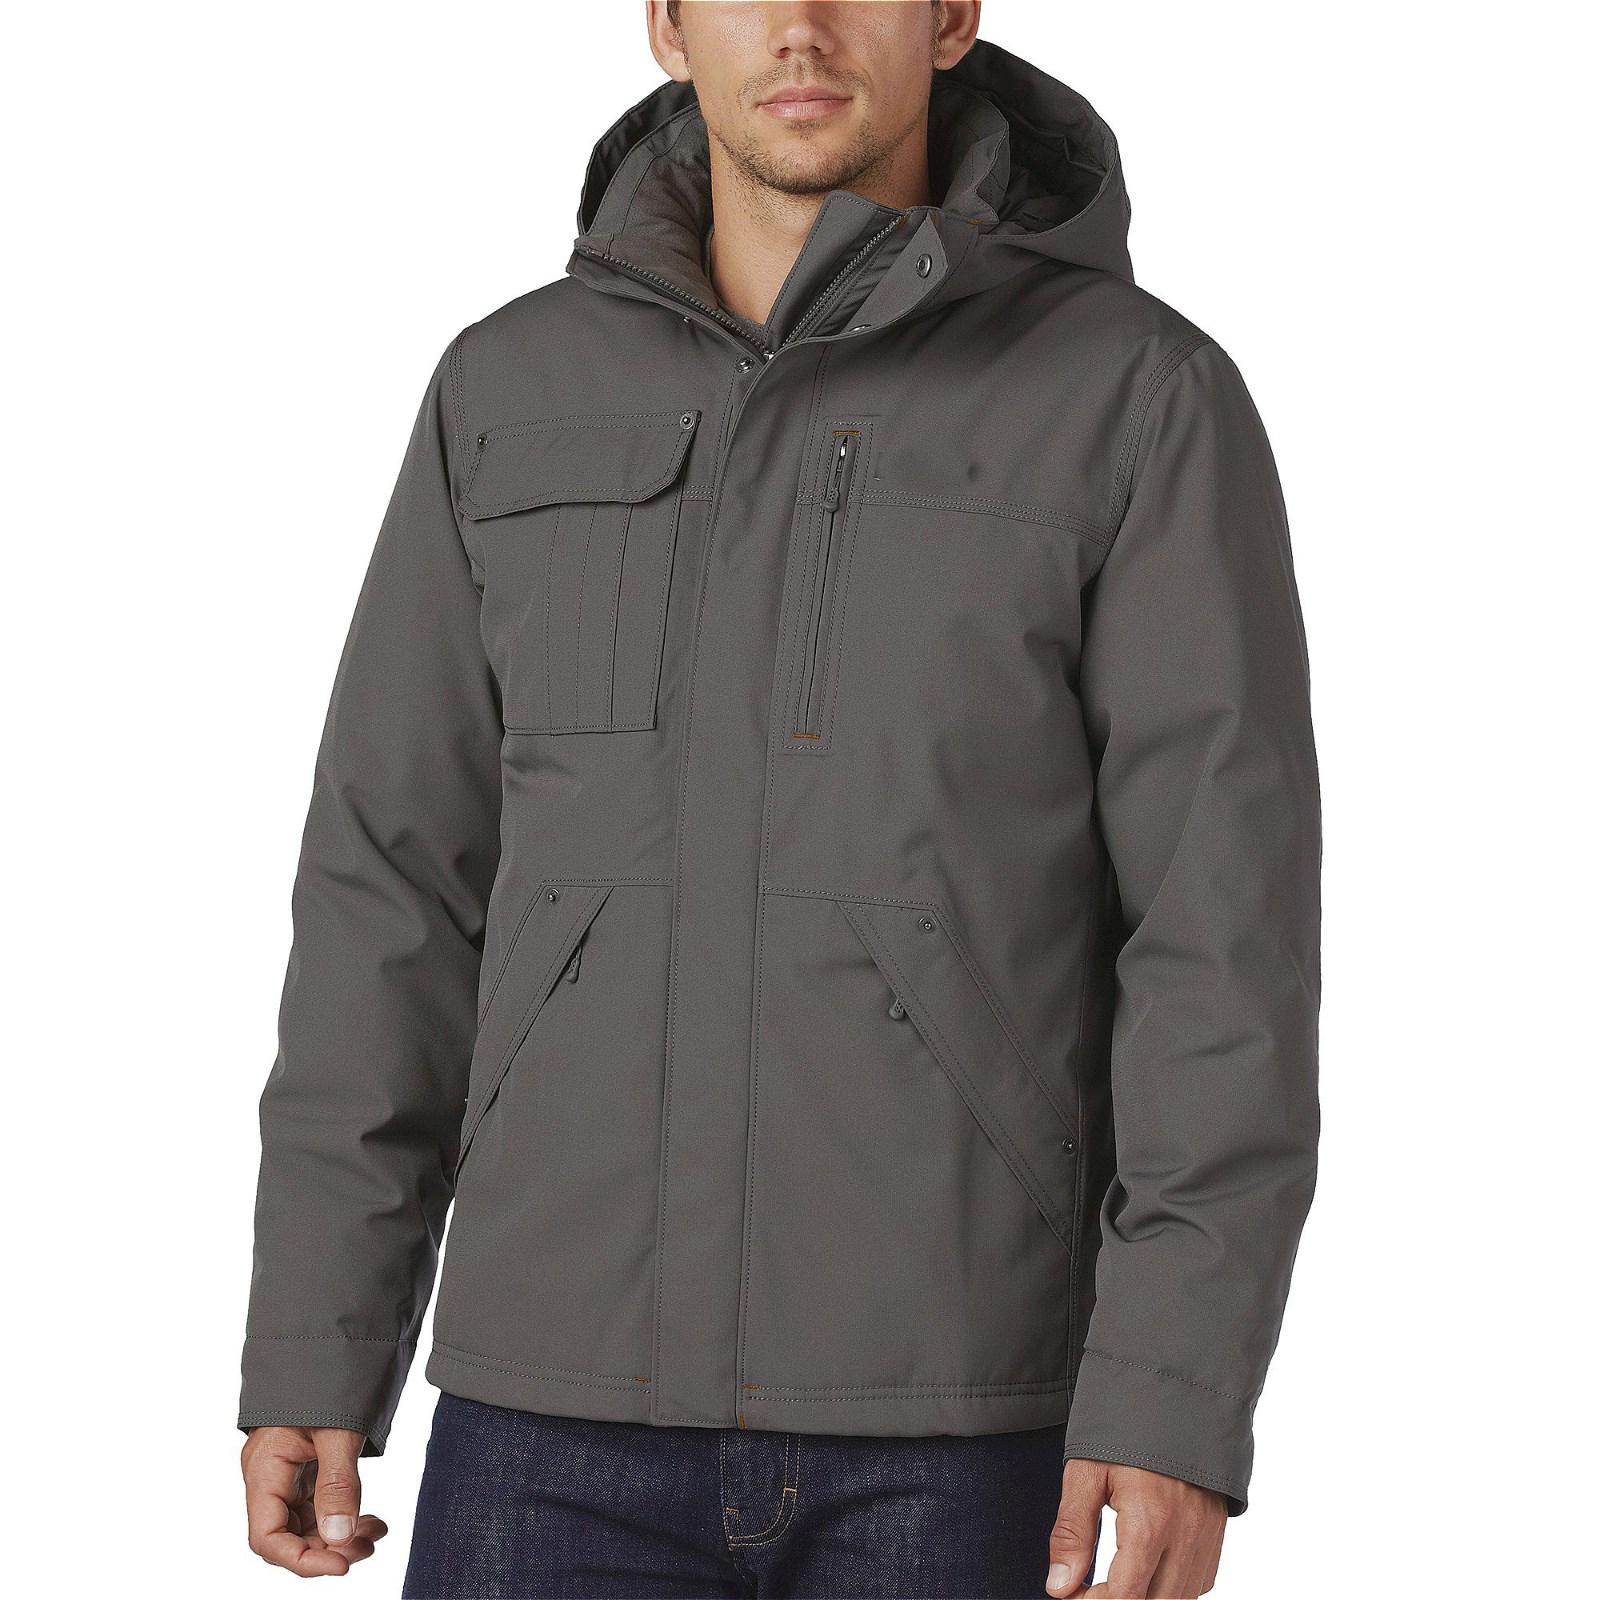 Men's Down Jacket Manufacturers, Men's Down Jacket Factory, Supply Men's Down Jacket